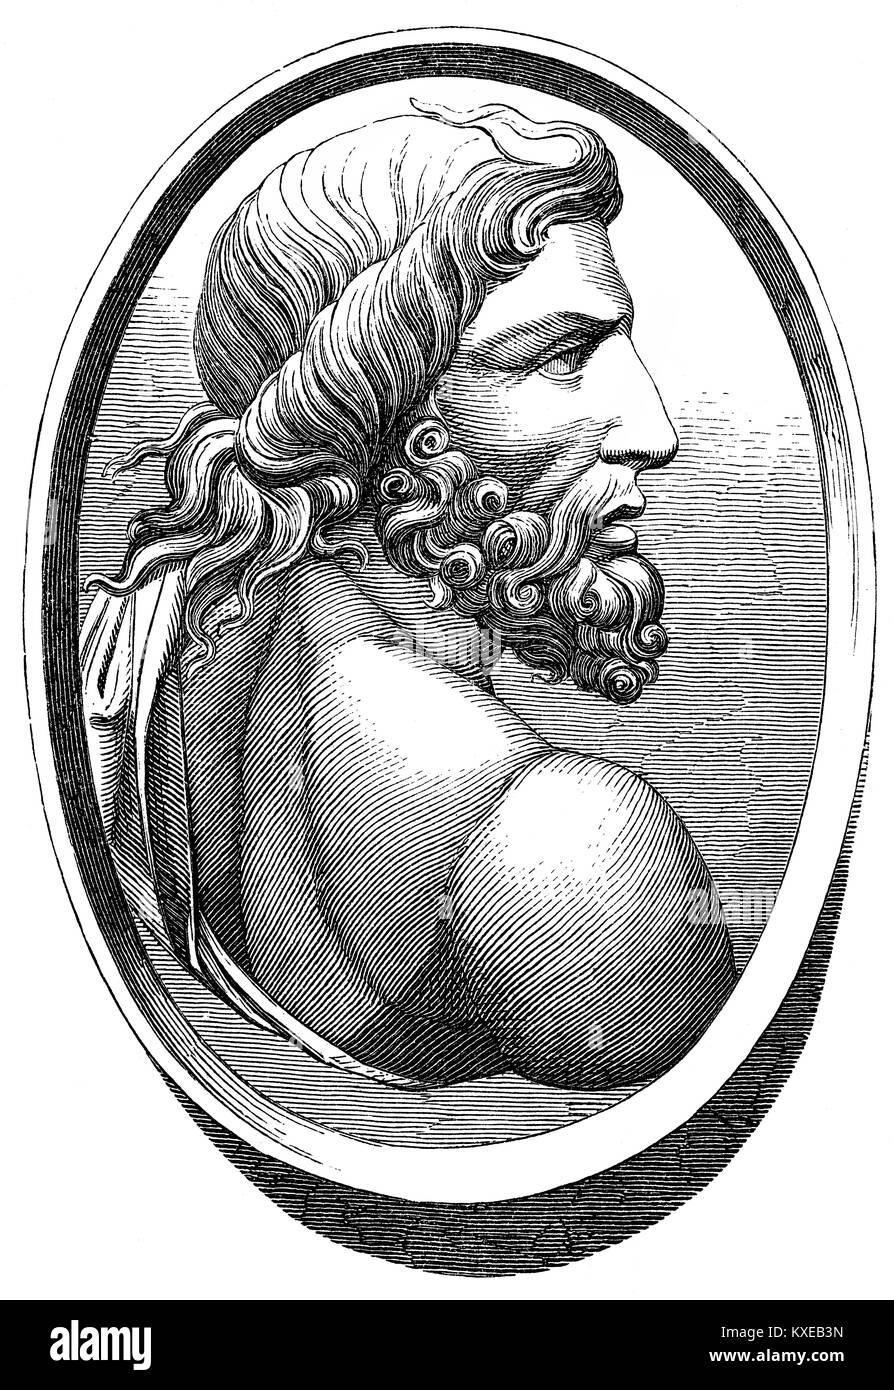 Poseidon, God of the seas, earthquakes, and tidal wave - Stock Image